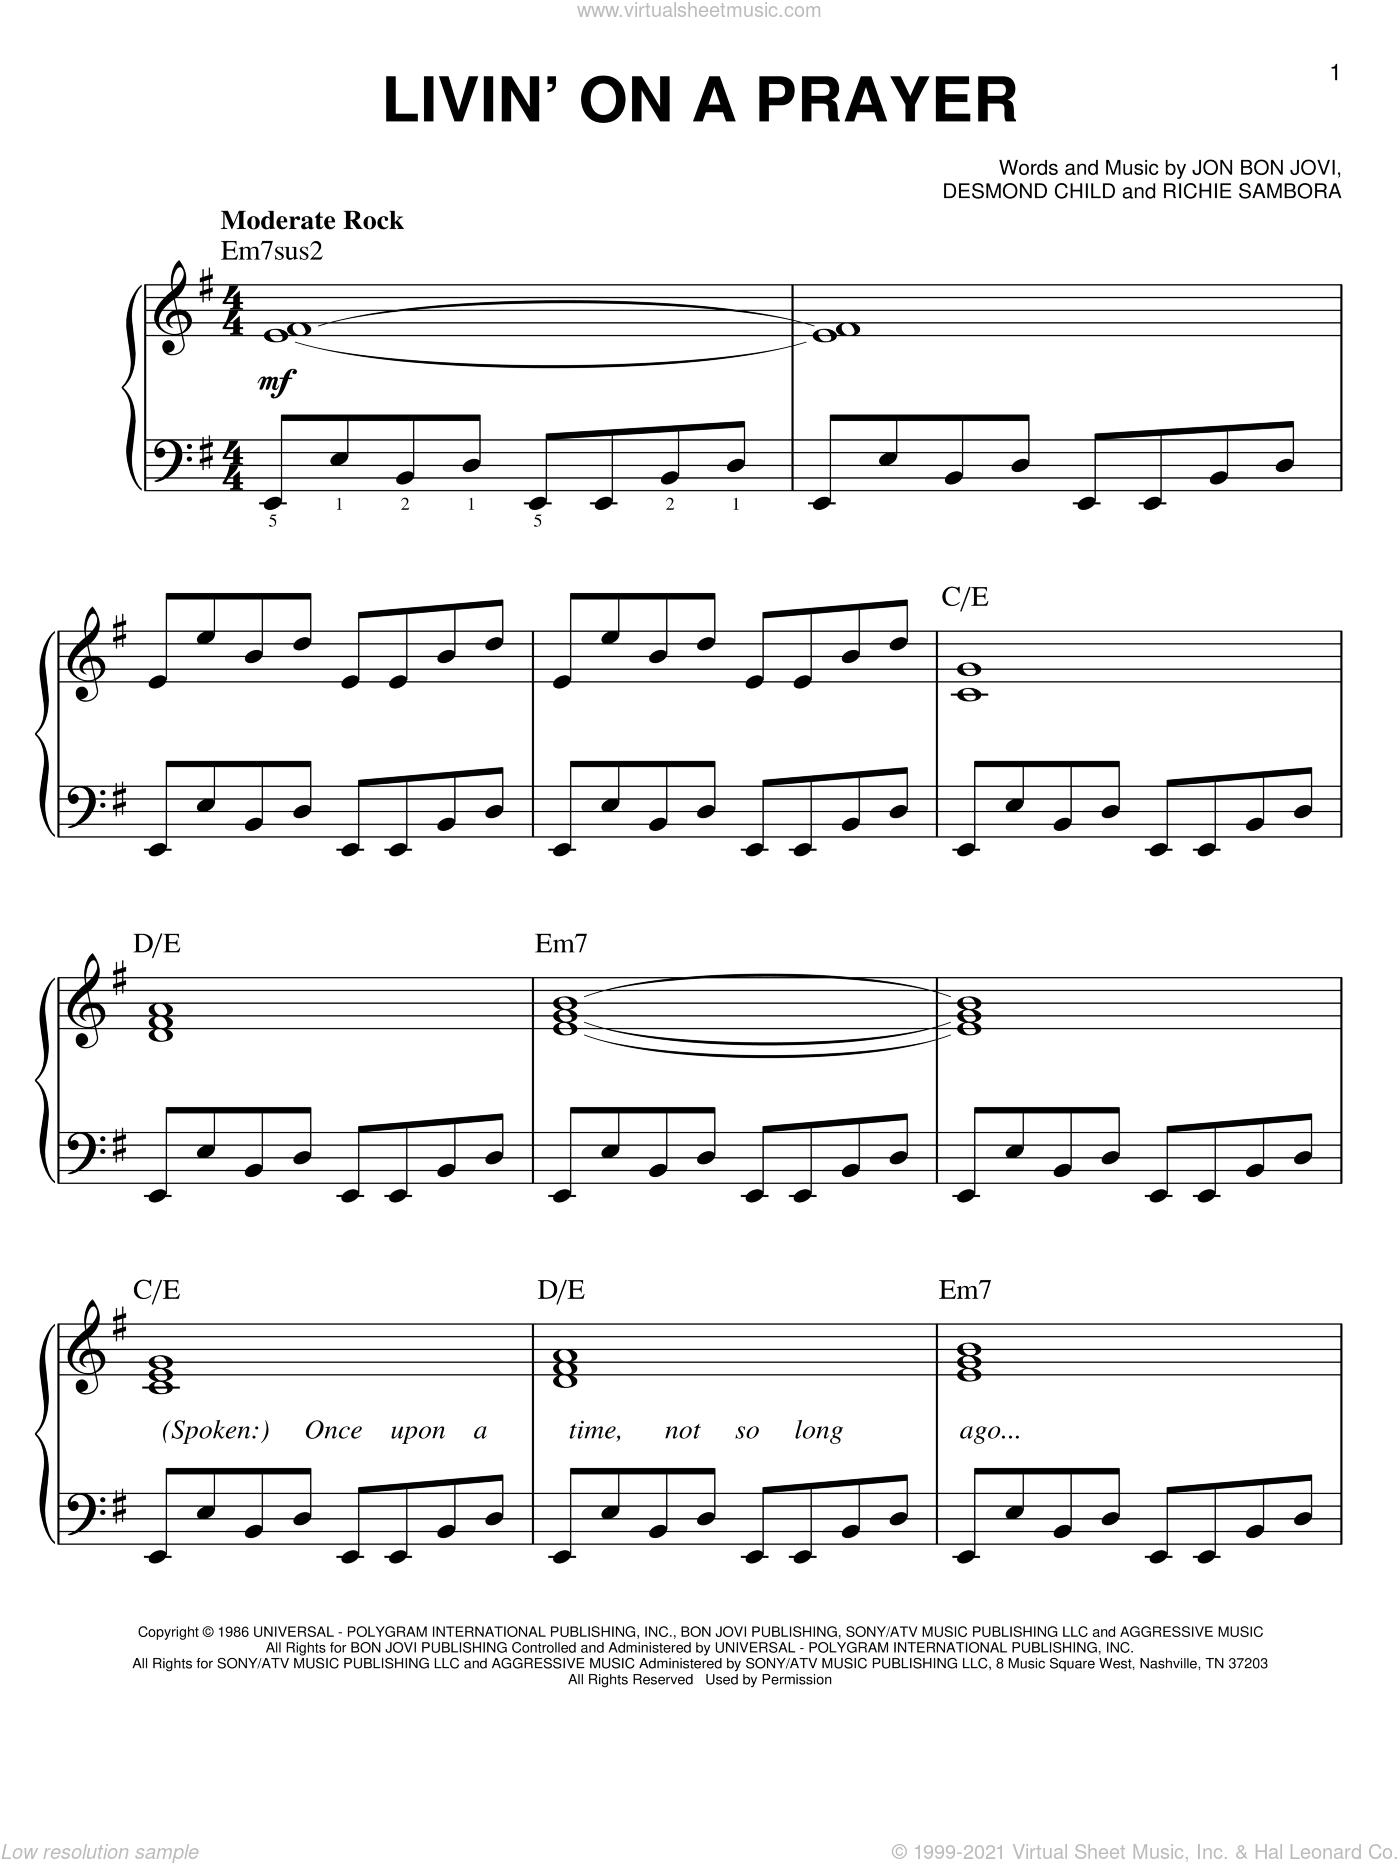 Jovi - Livin' On A Prayer sheet music (easy) for piano solo [PDF]